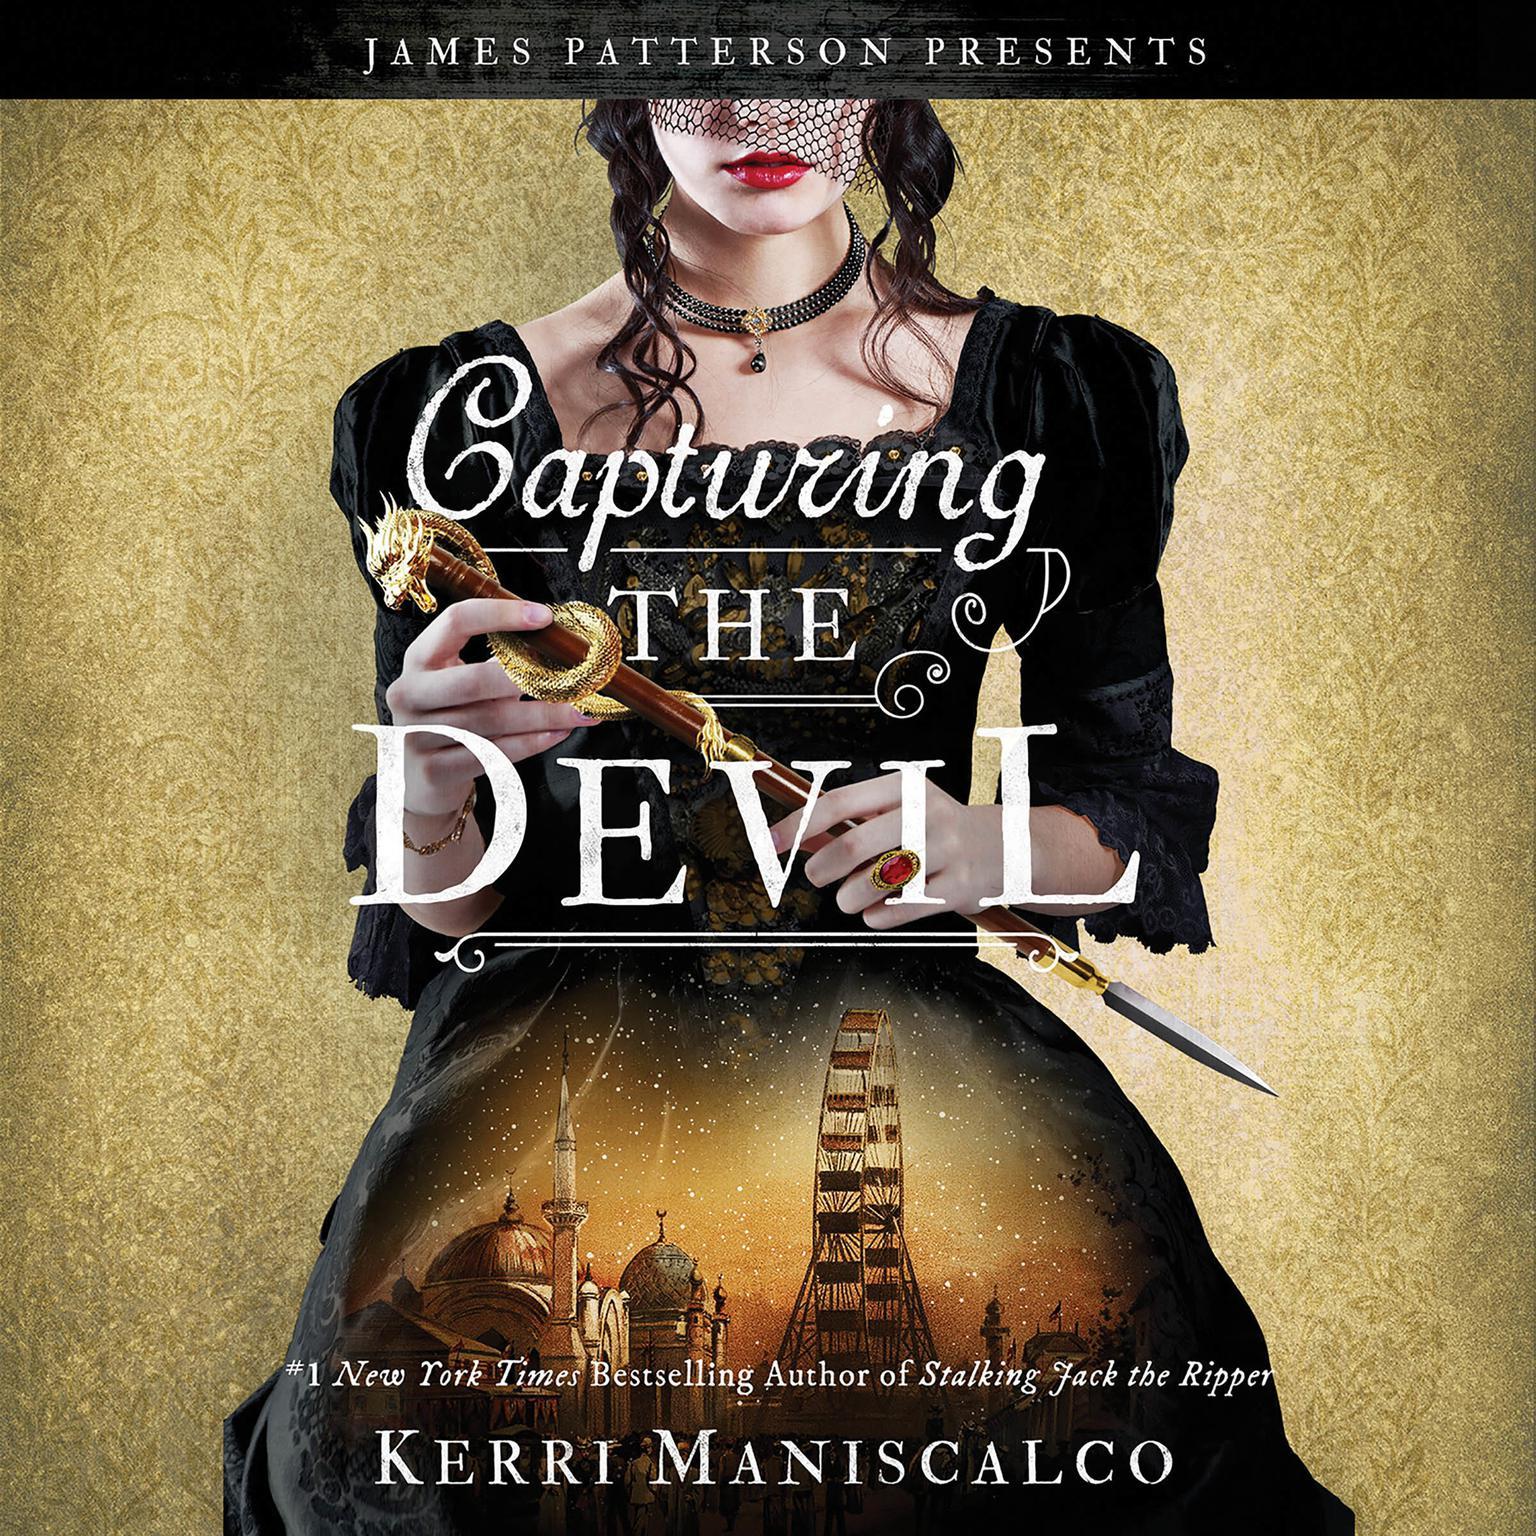 Printable Capturing the Devil Audiobook Cover Art